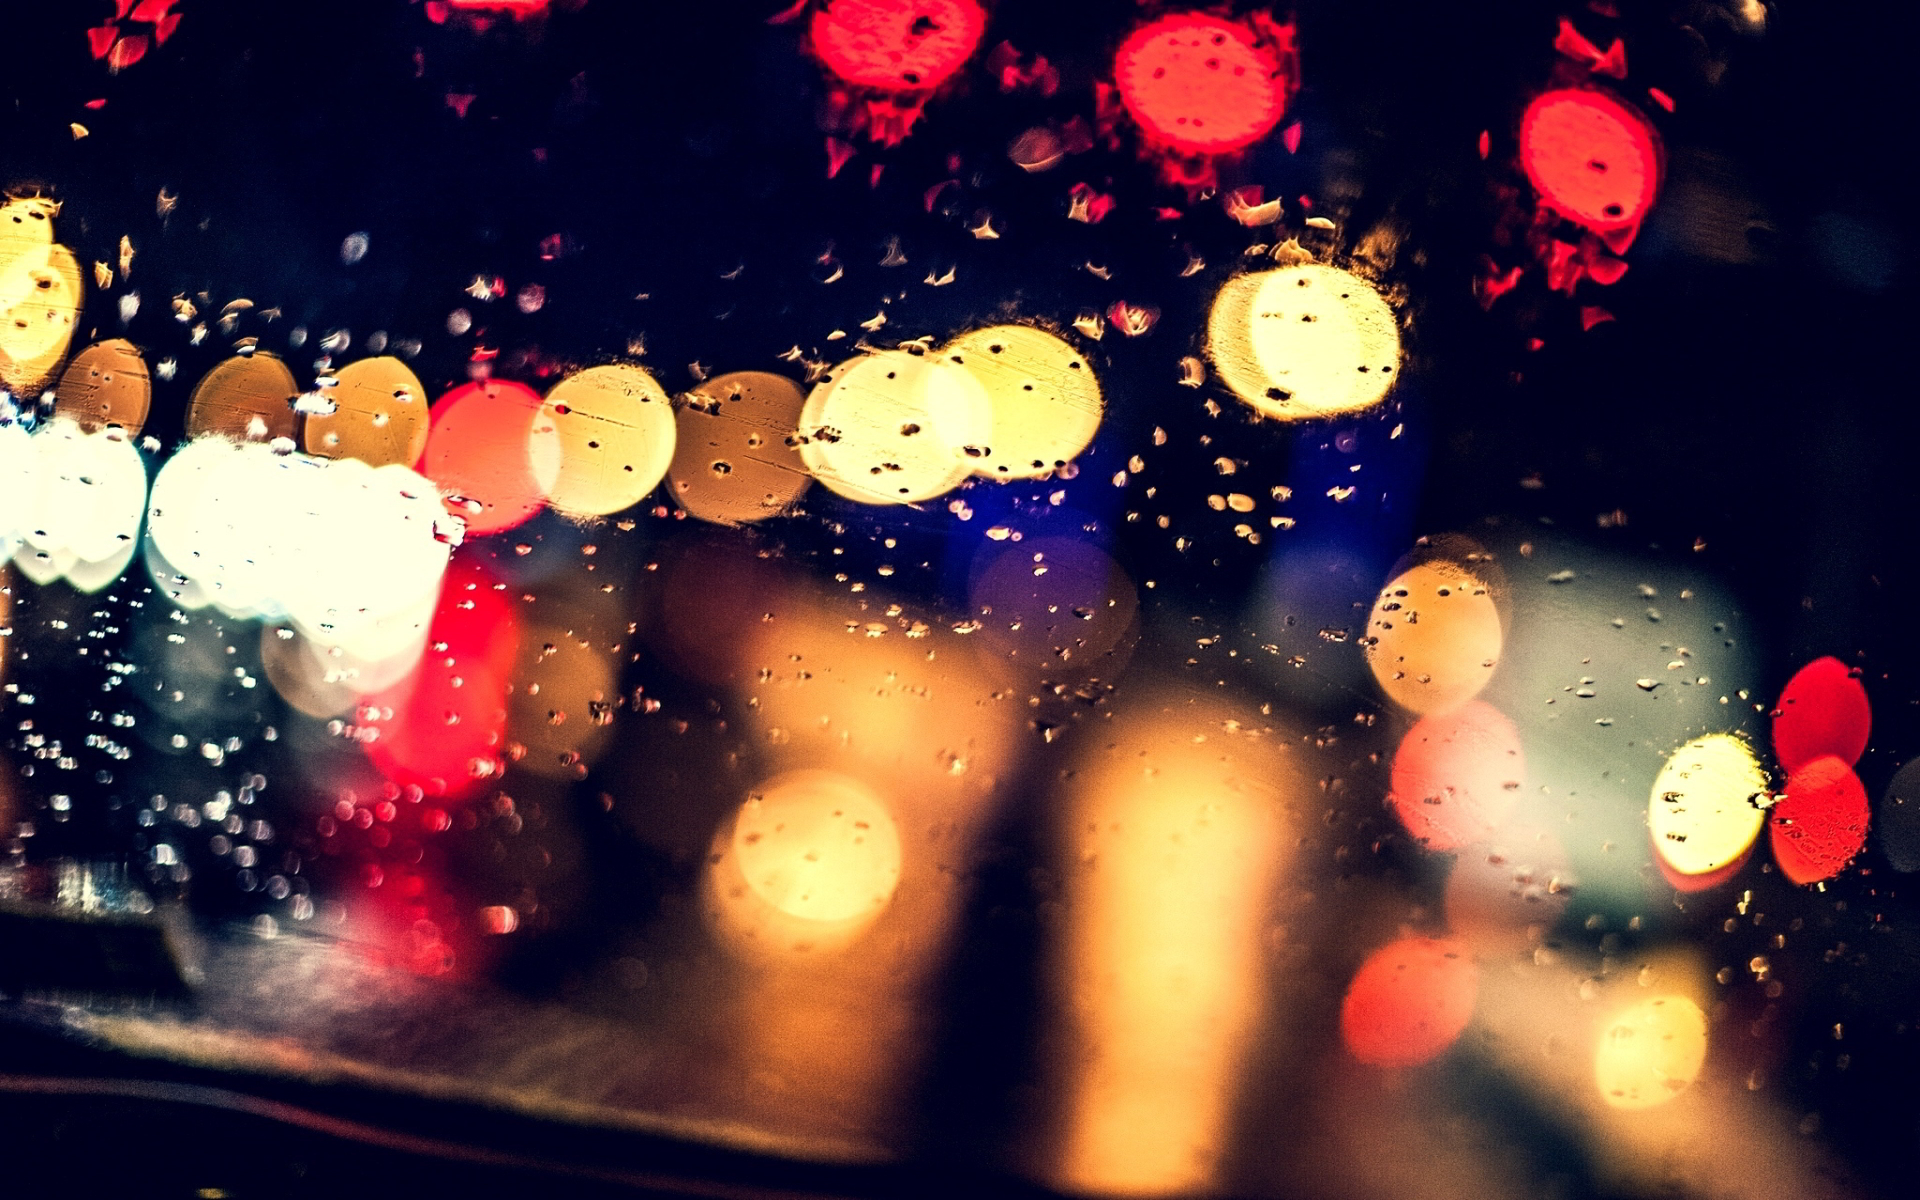 Night wet glass lights